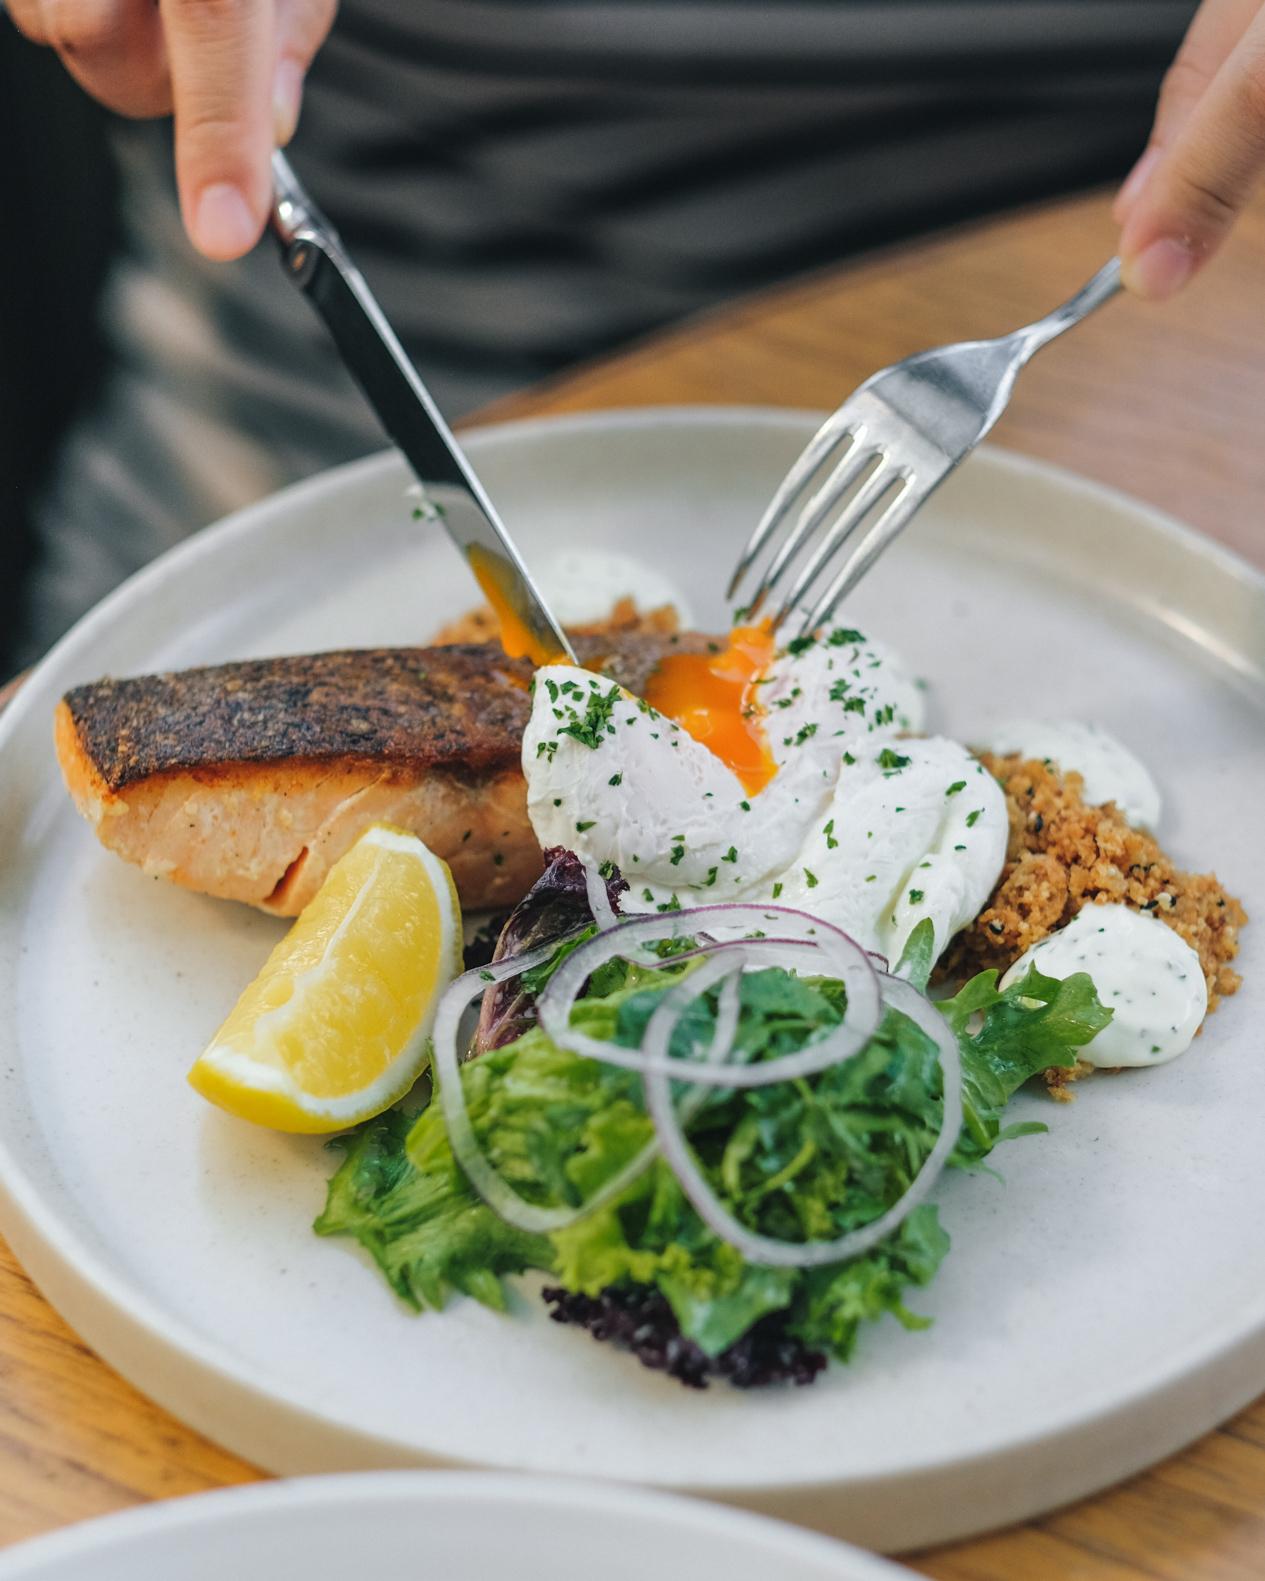 Mei 2018 Eatandtreats Indonesian Food And Travel Blogger Based Voucher Makan Basque Jakarta Pork Belly Egg Florentine Idr 95k